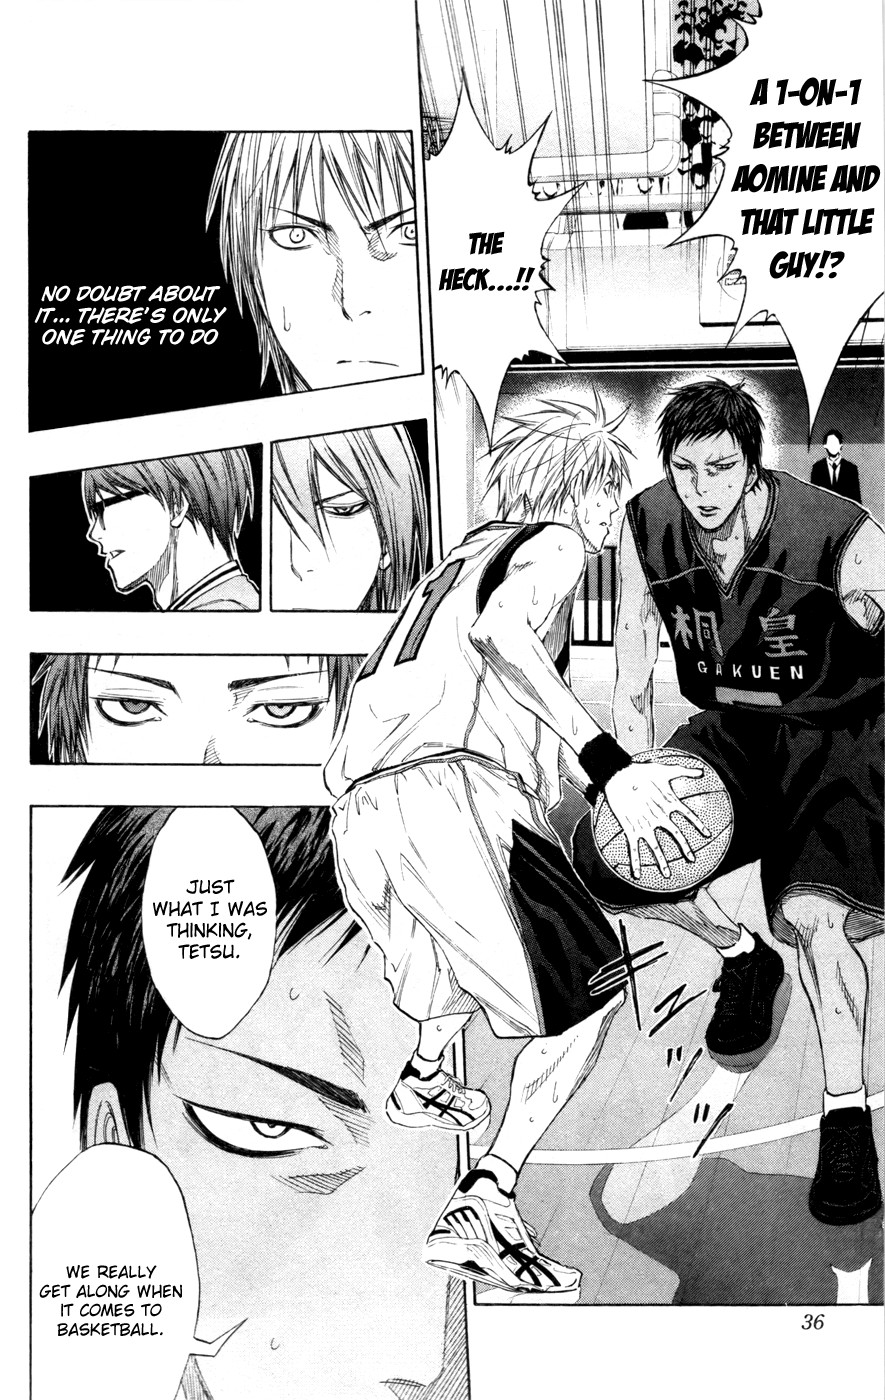 Kuroko no Basket Manga Chapter 119 - Image 4_036